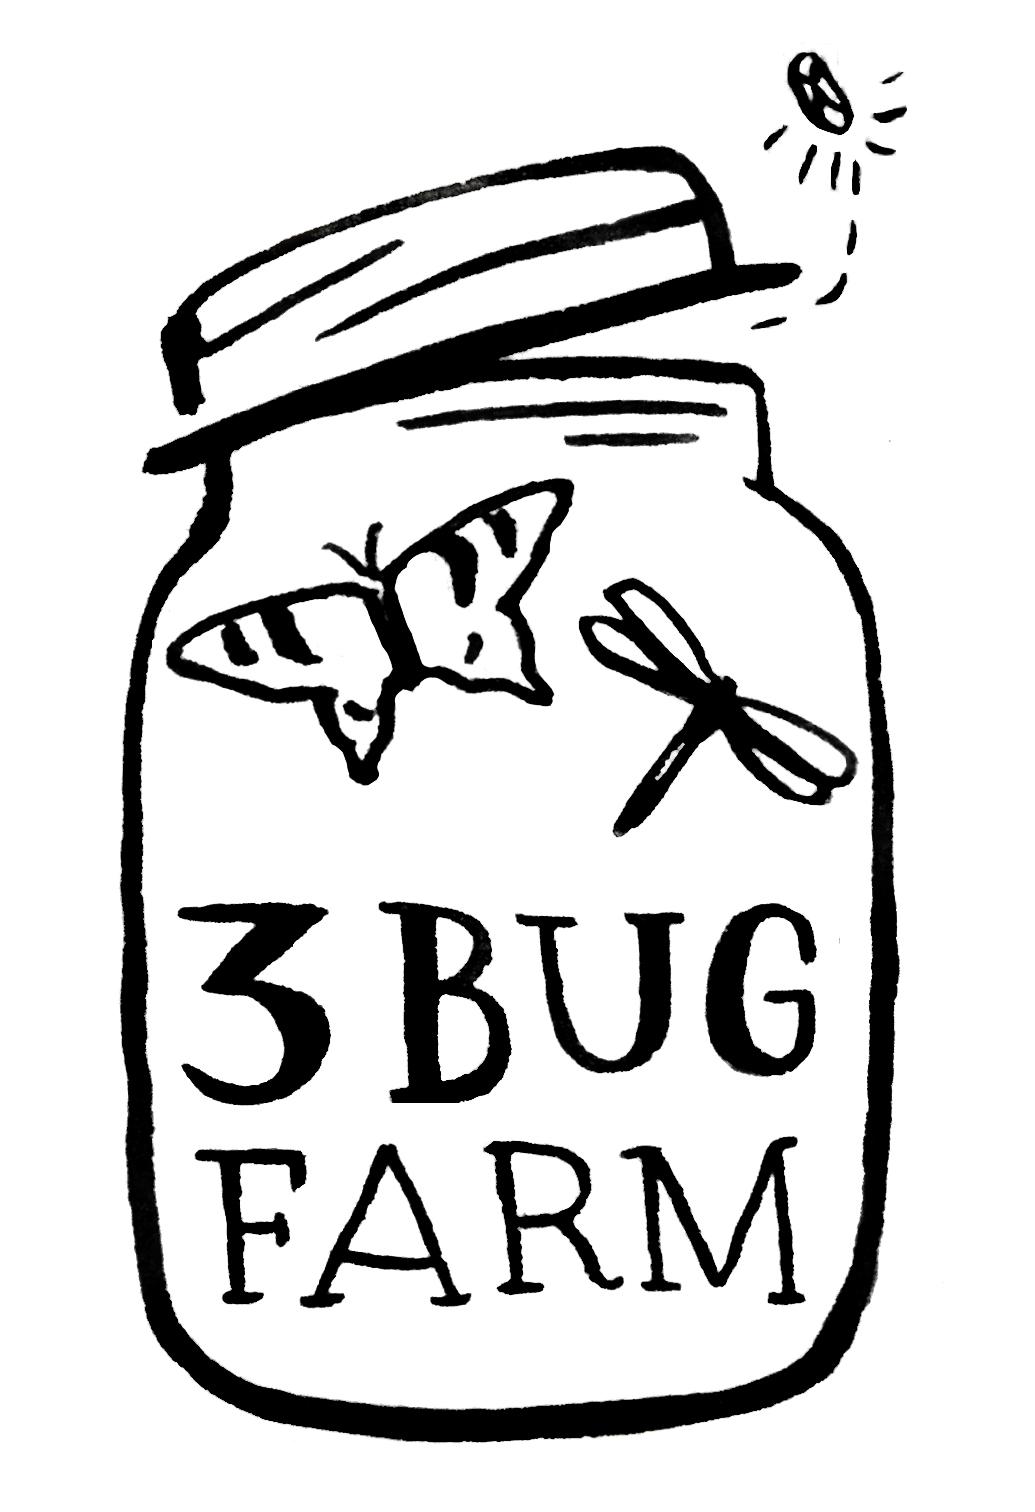 3 Bug Farm logo. Organic family farm in Mid-coast Maine.     Learn more…